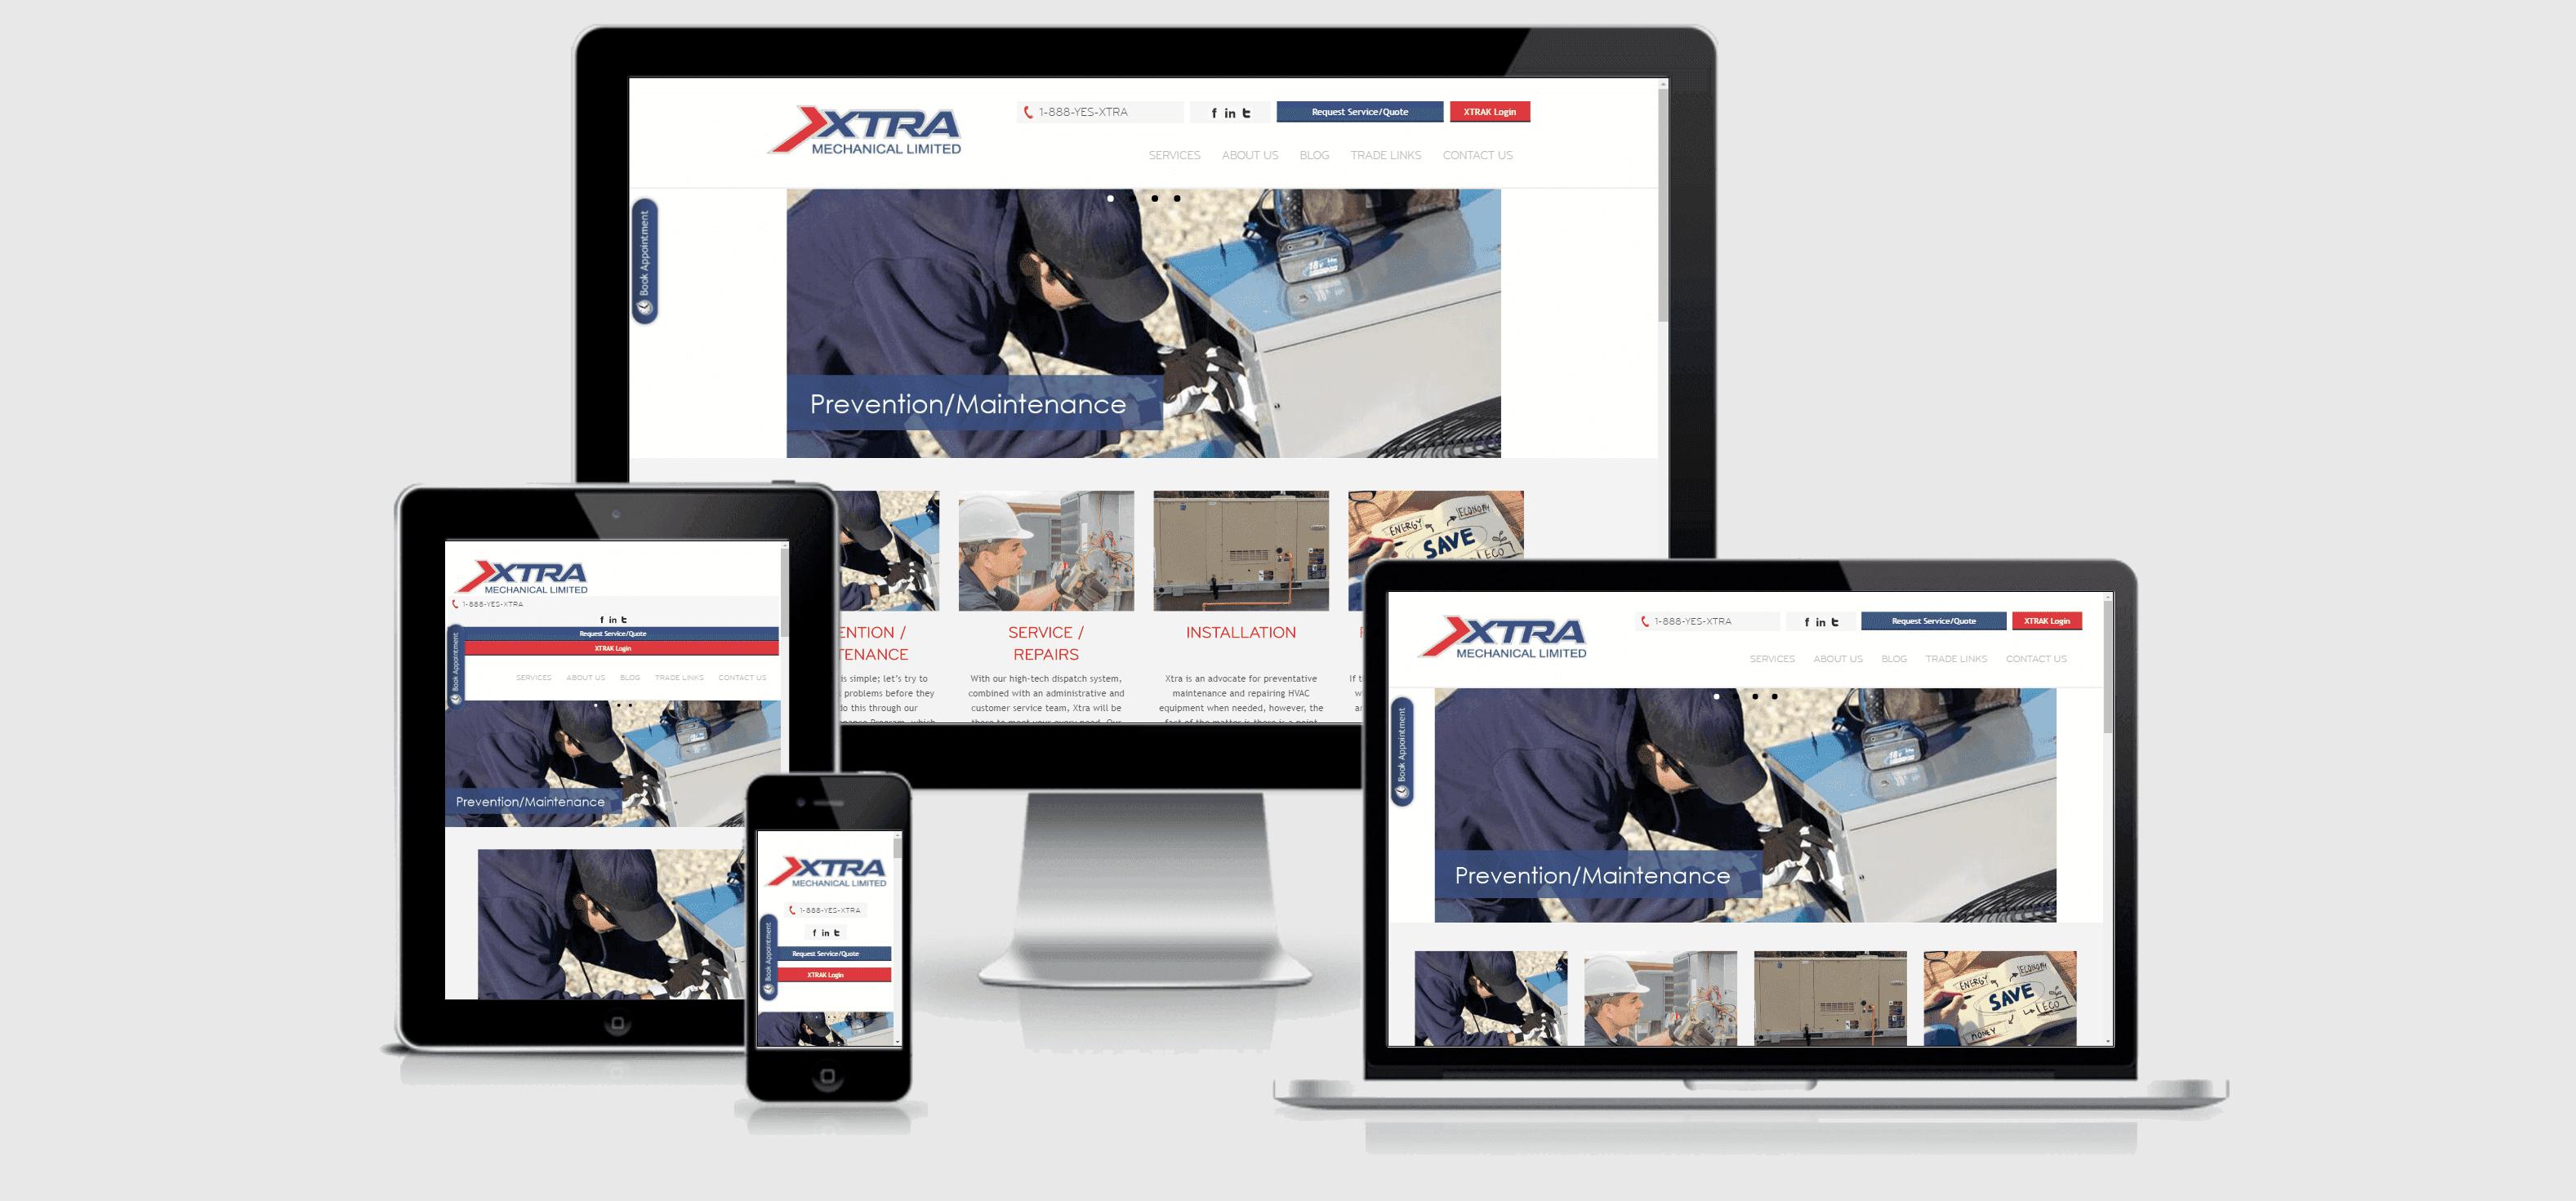 XTRA Mechanical Ltd